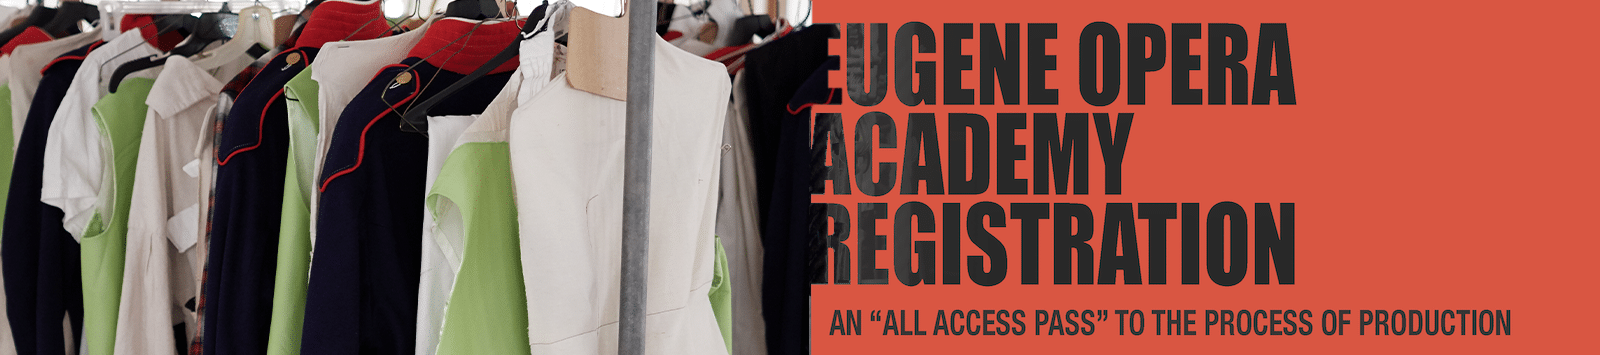 eugene opera academy leaderboard 5-17-2019